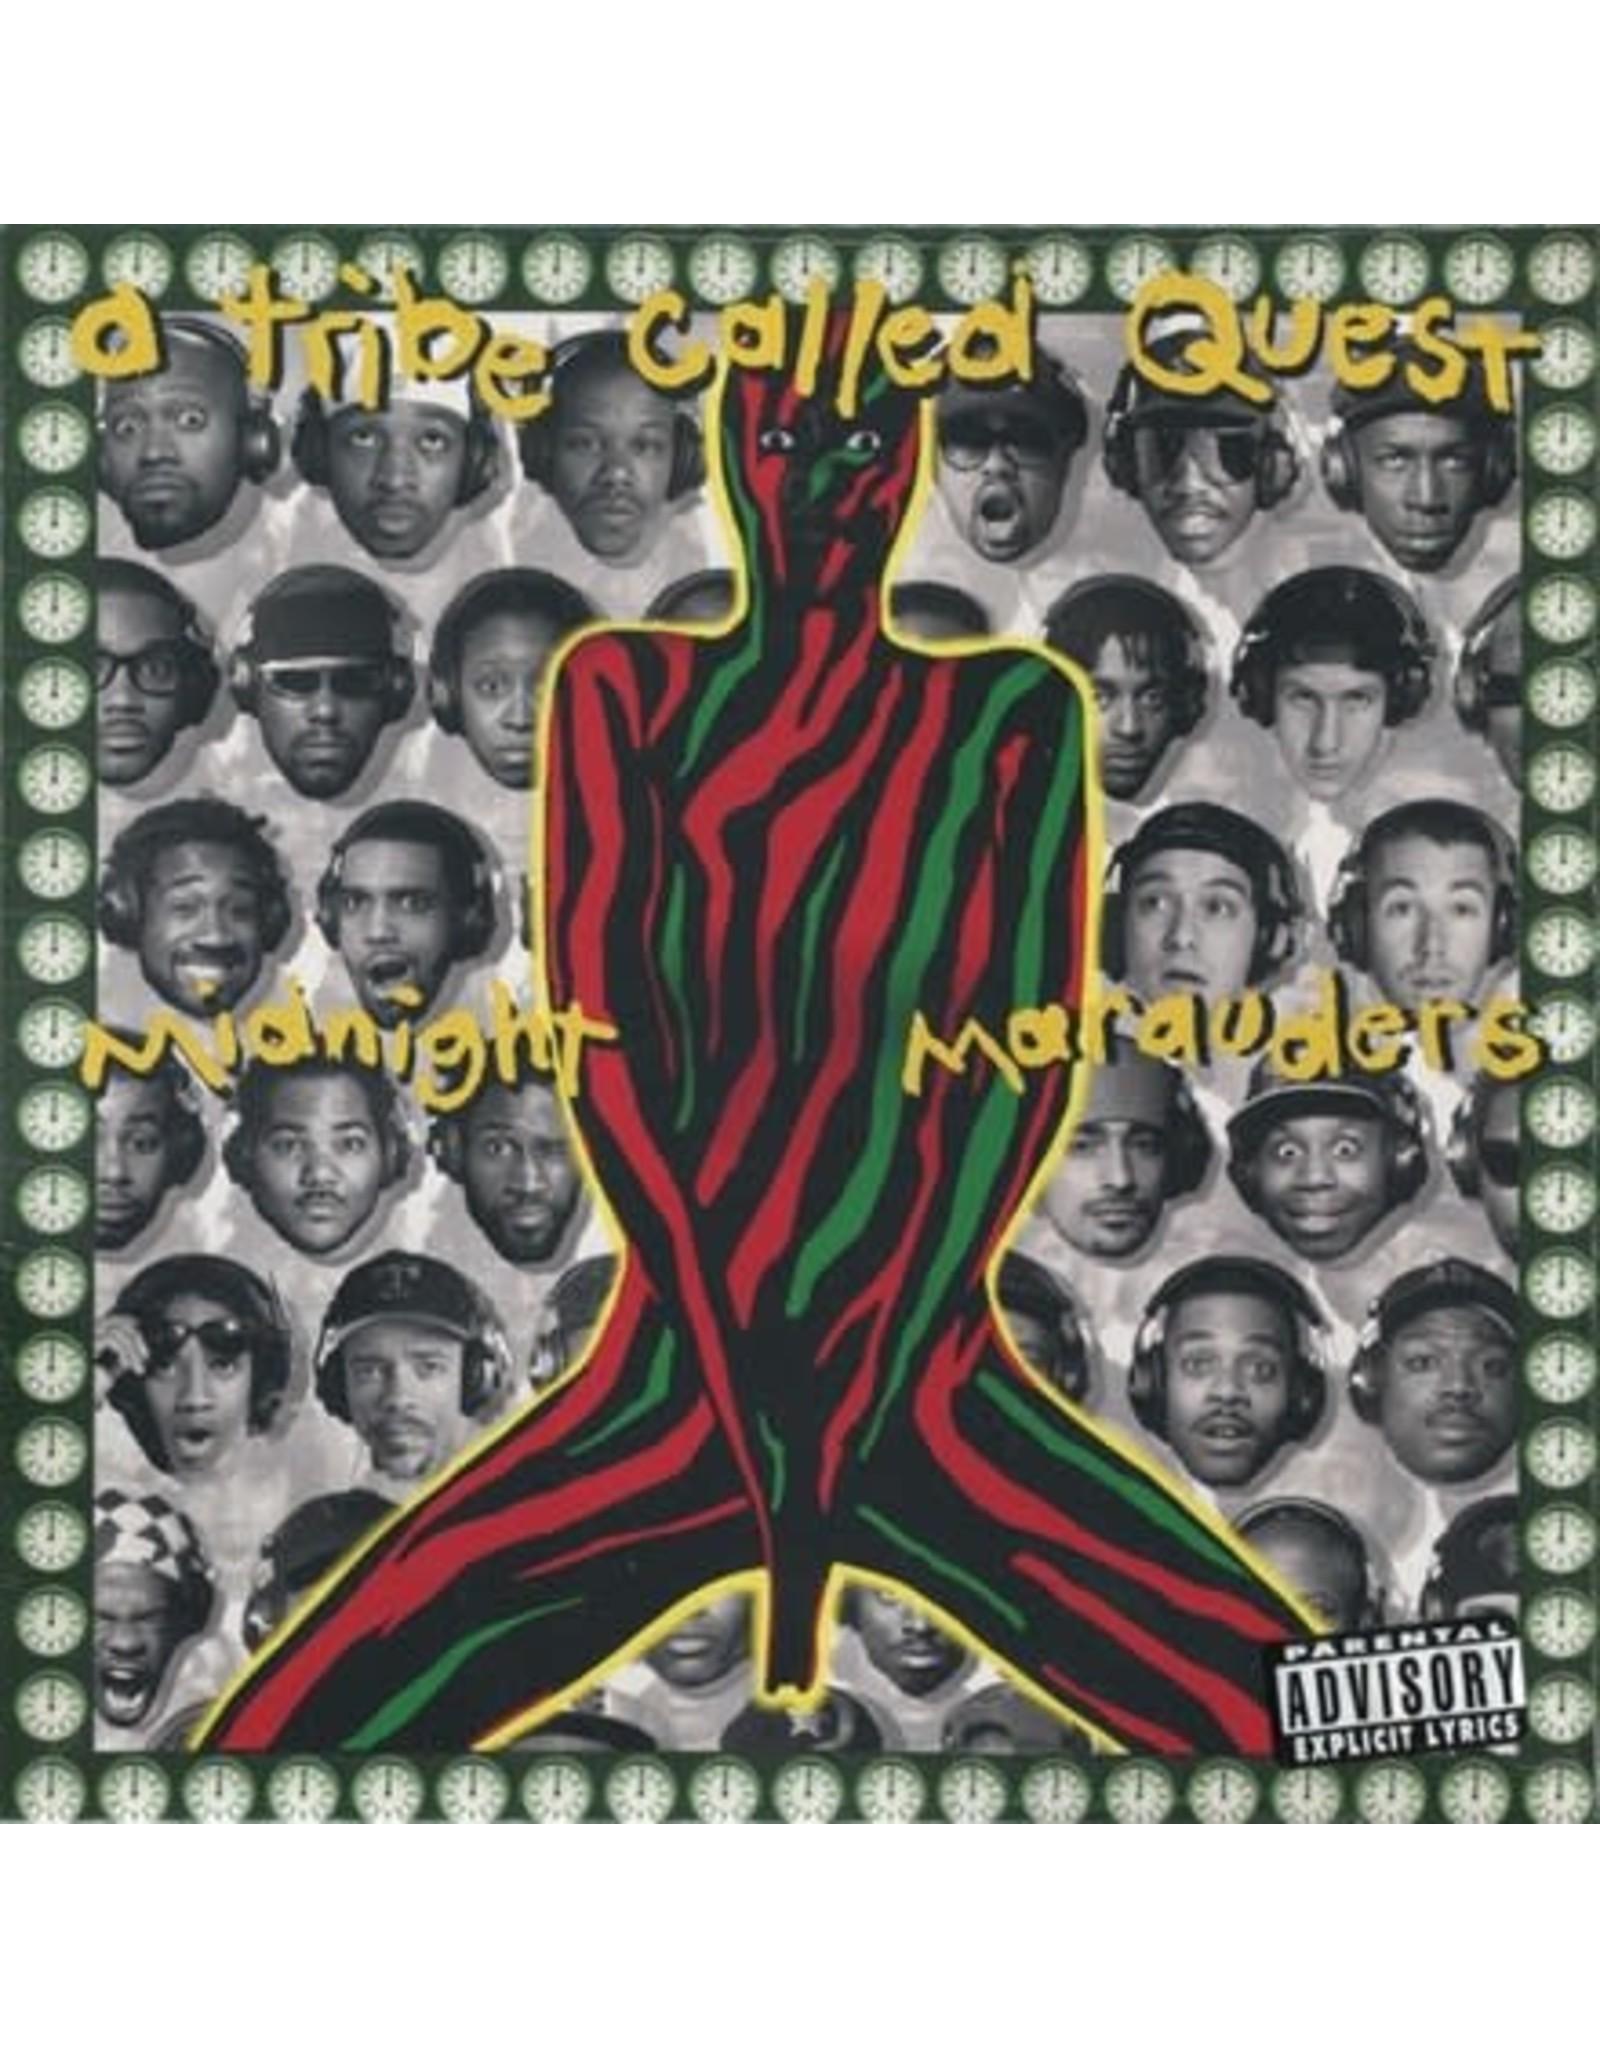 Jive A Tribe Called Quest: Midnight Marauders LP